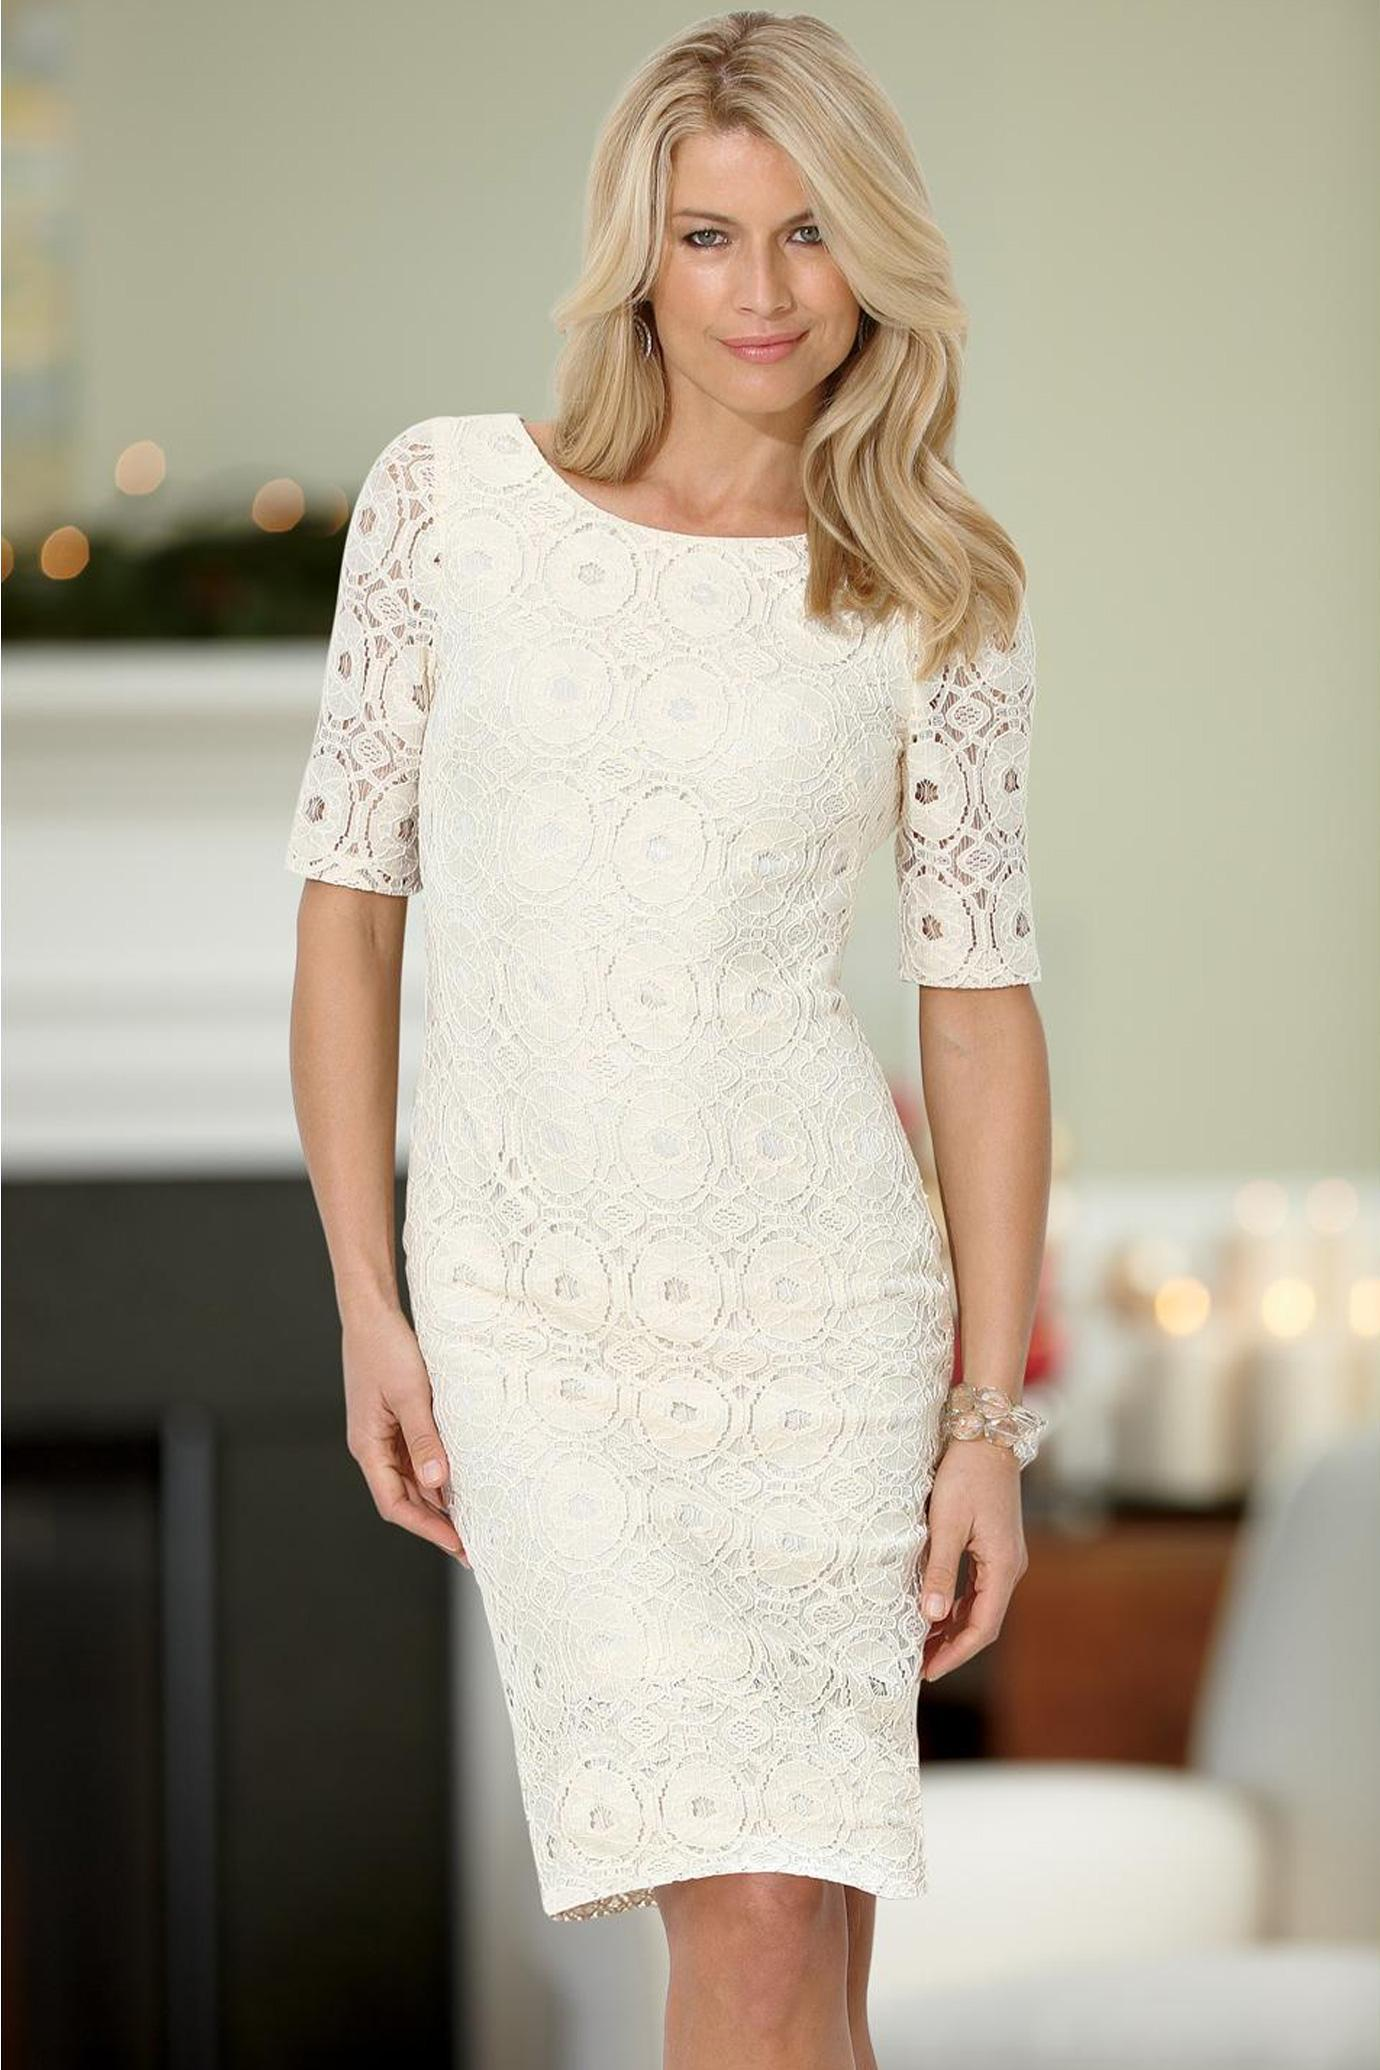 Lace Sheath Dress Picture Collection Dressedupgirl Com